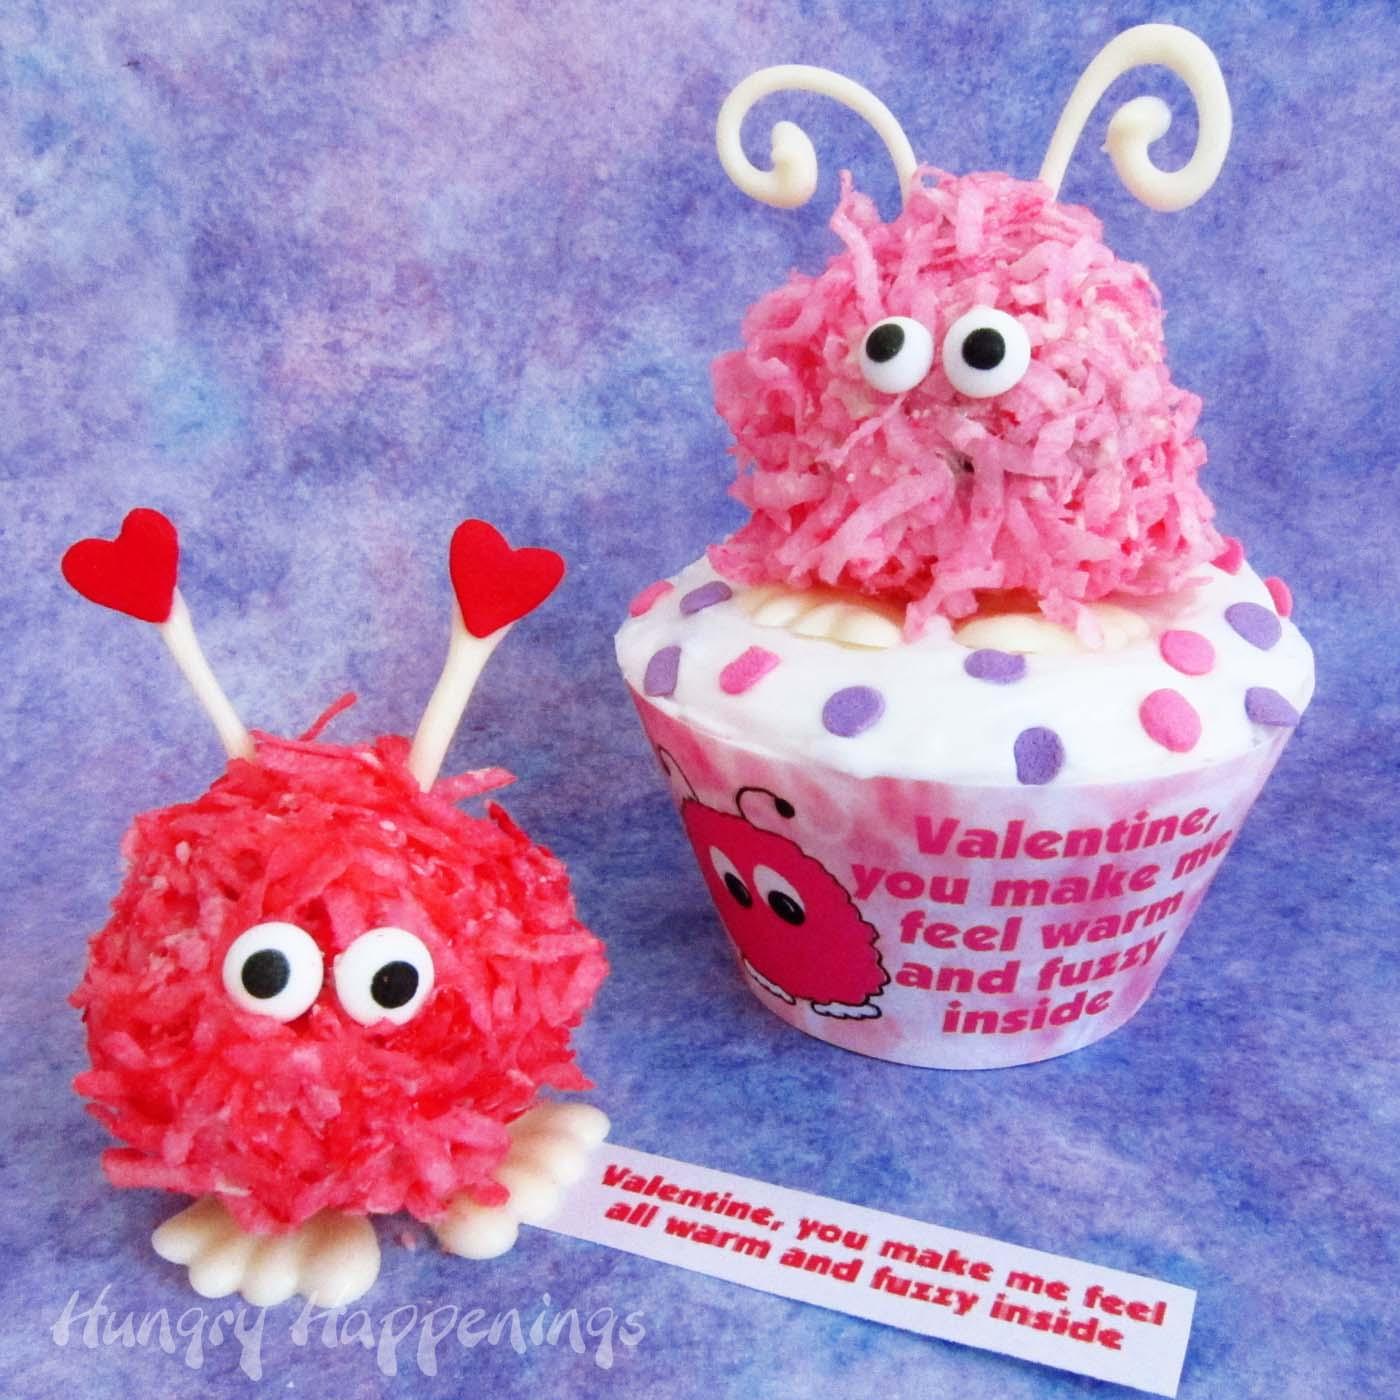 Sweet Chocolate Cherry Bombs- Valentine's Day Dessert